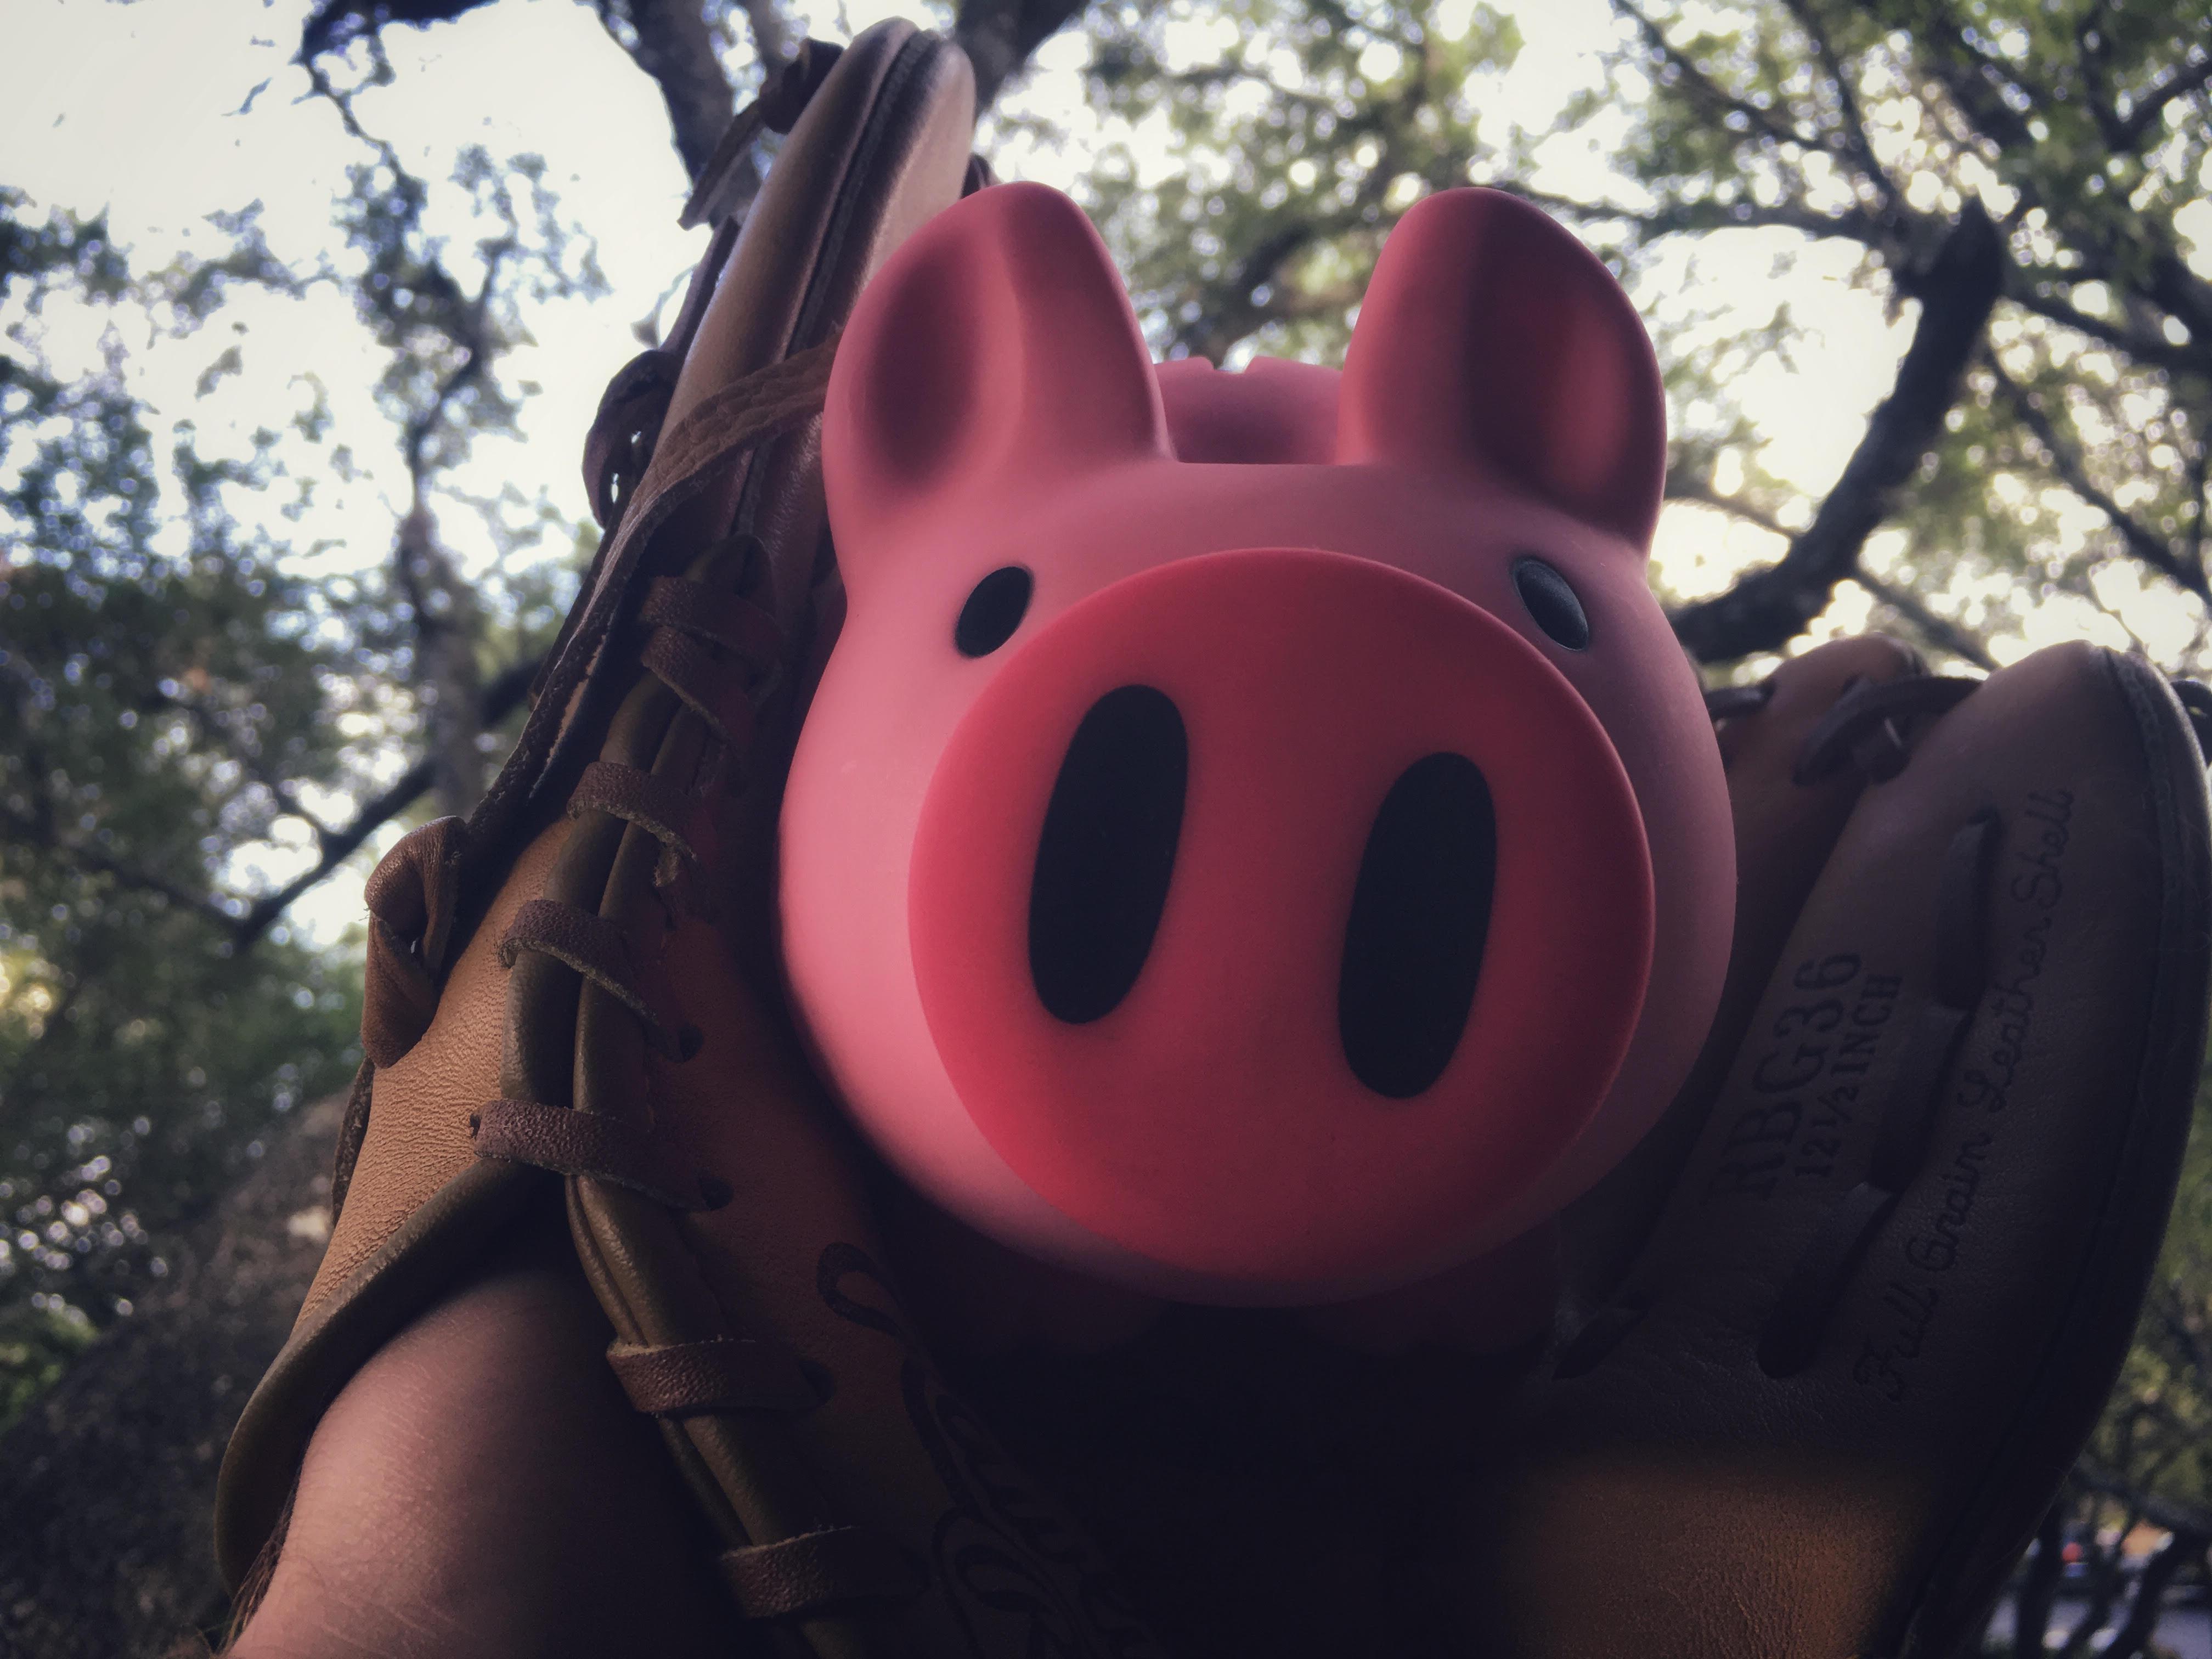 The Z5 piggy bank gets caught in a baseball glove.